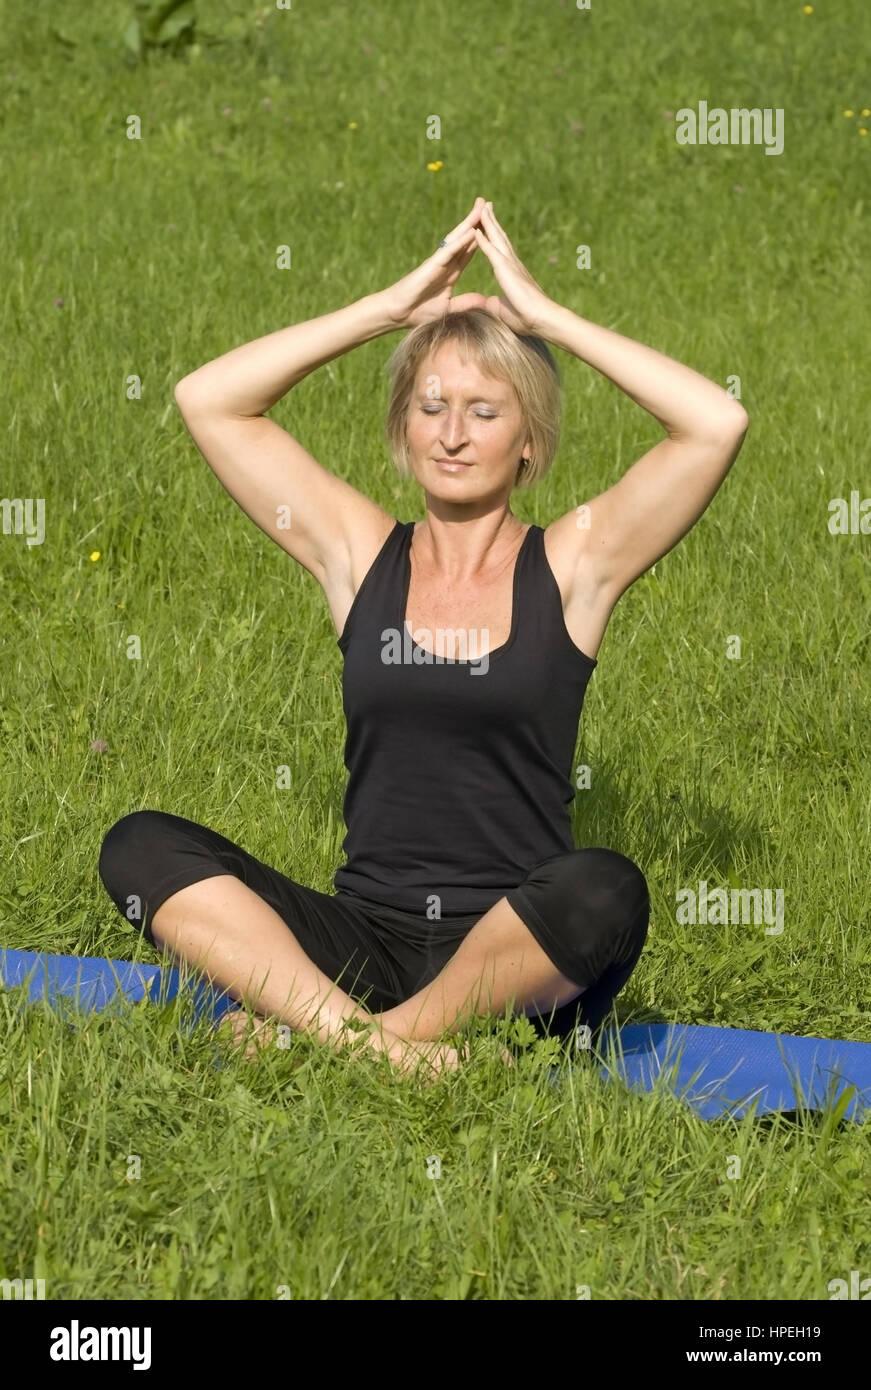 Frau macht Joga in der Wiese - woman does yoga in meadow - Stock Image